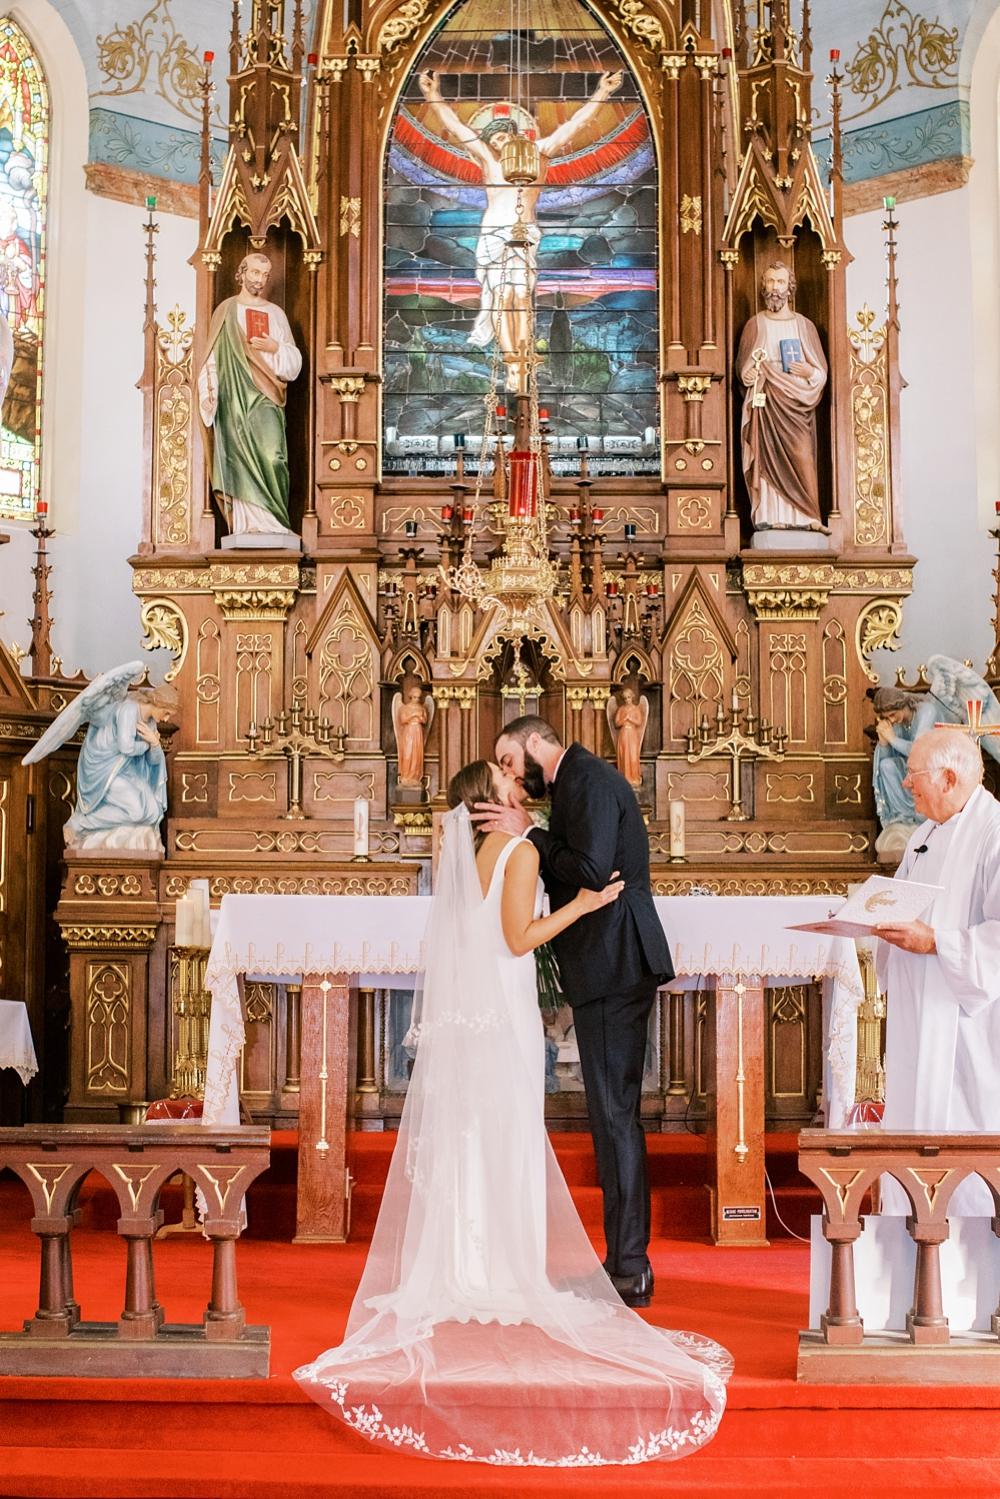 Kristin-La-Voie-Photography-austin-houston-texas-wedding-photographer-the-oaks-at-high-hill -79